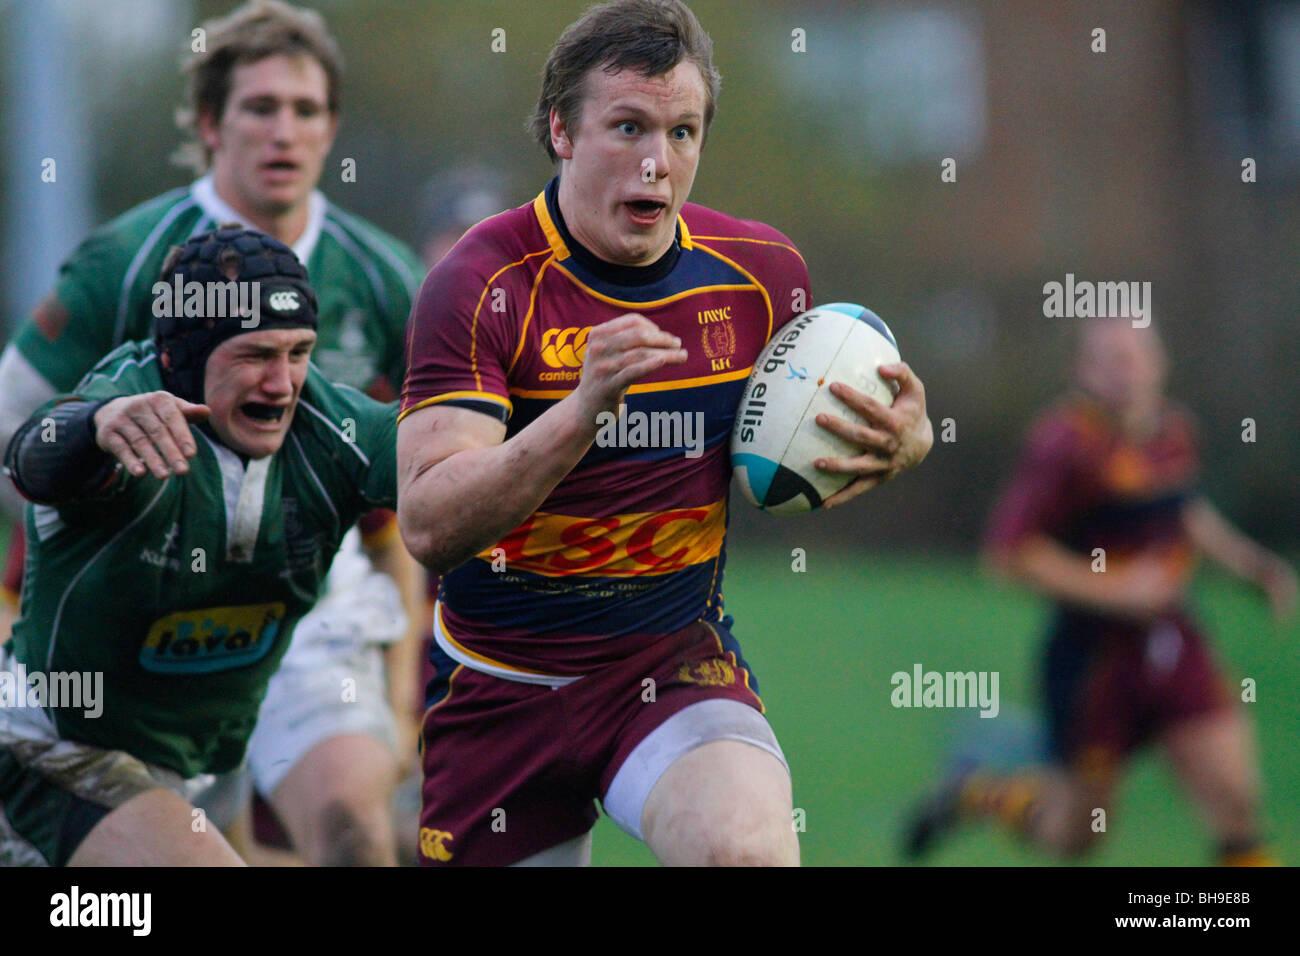 Rugby attaquer durant un match. Photo Stock